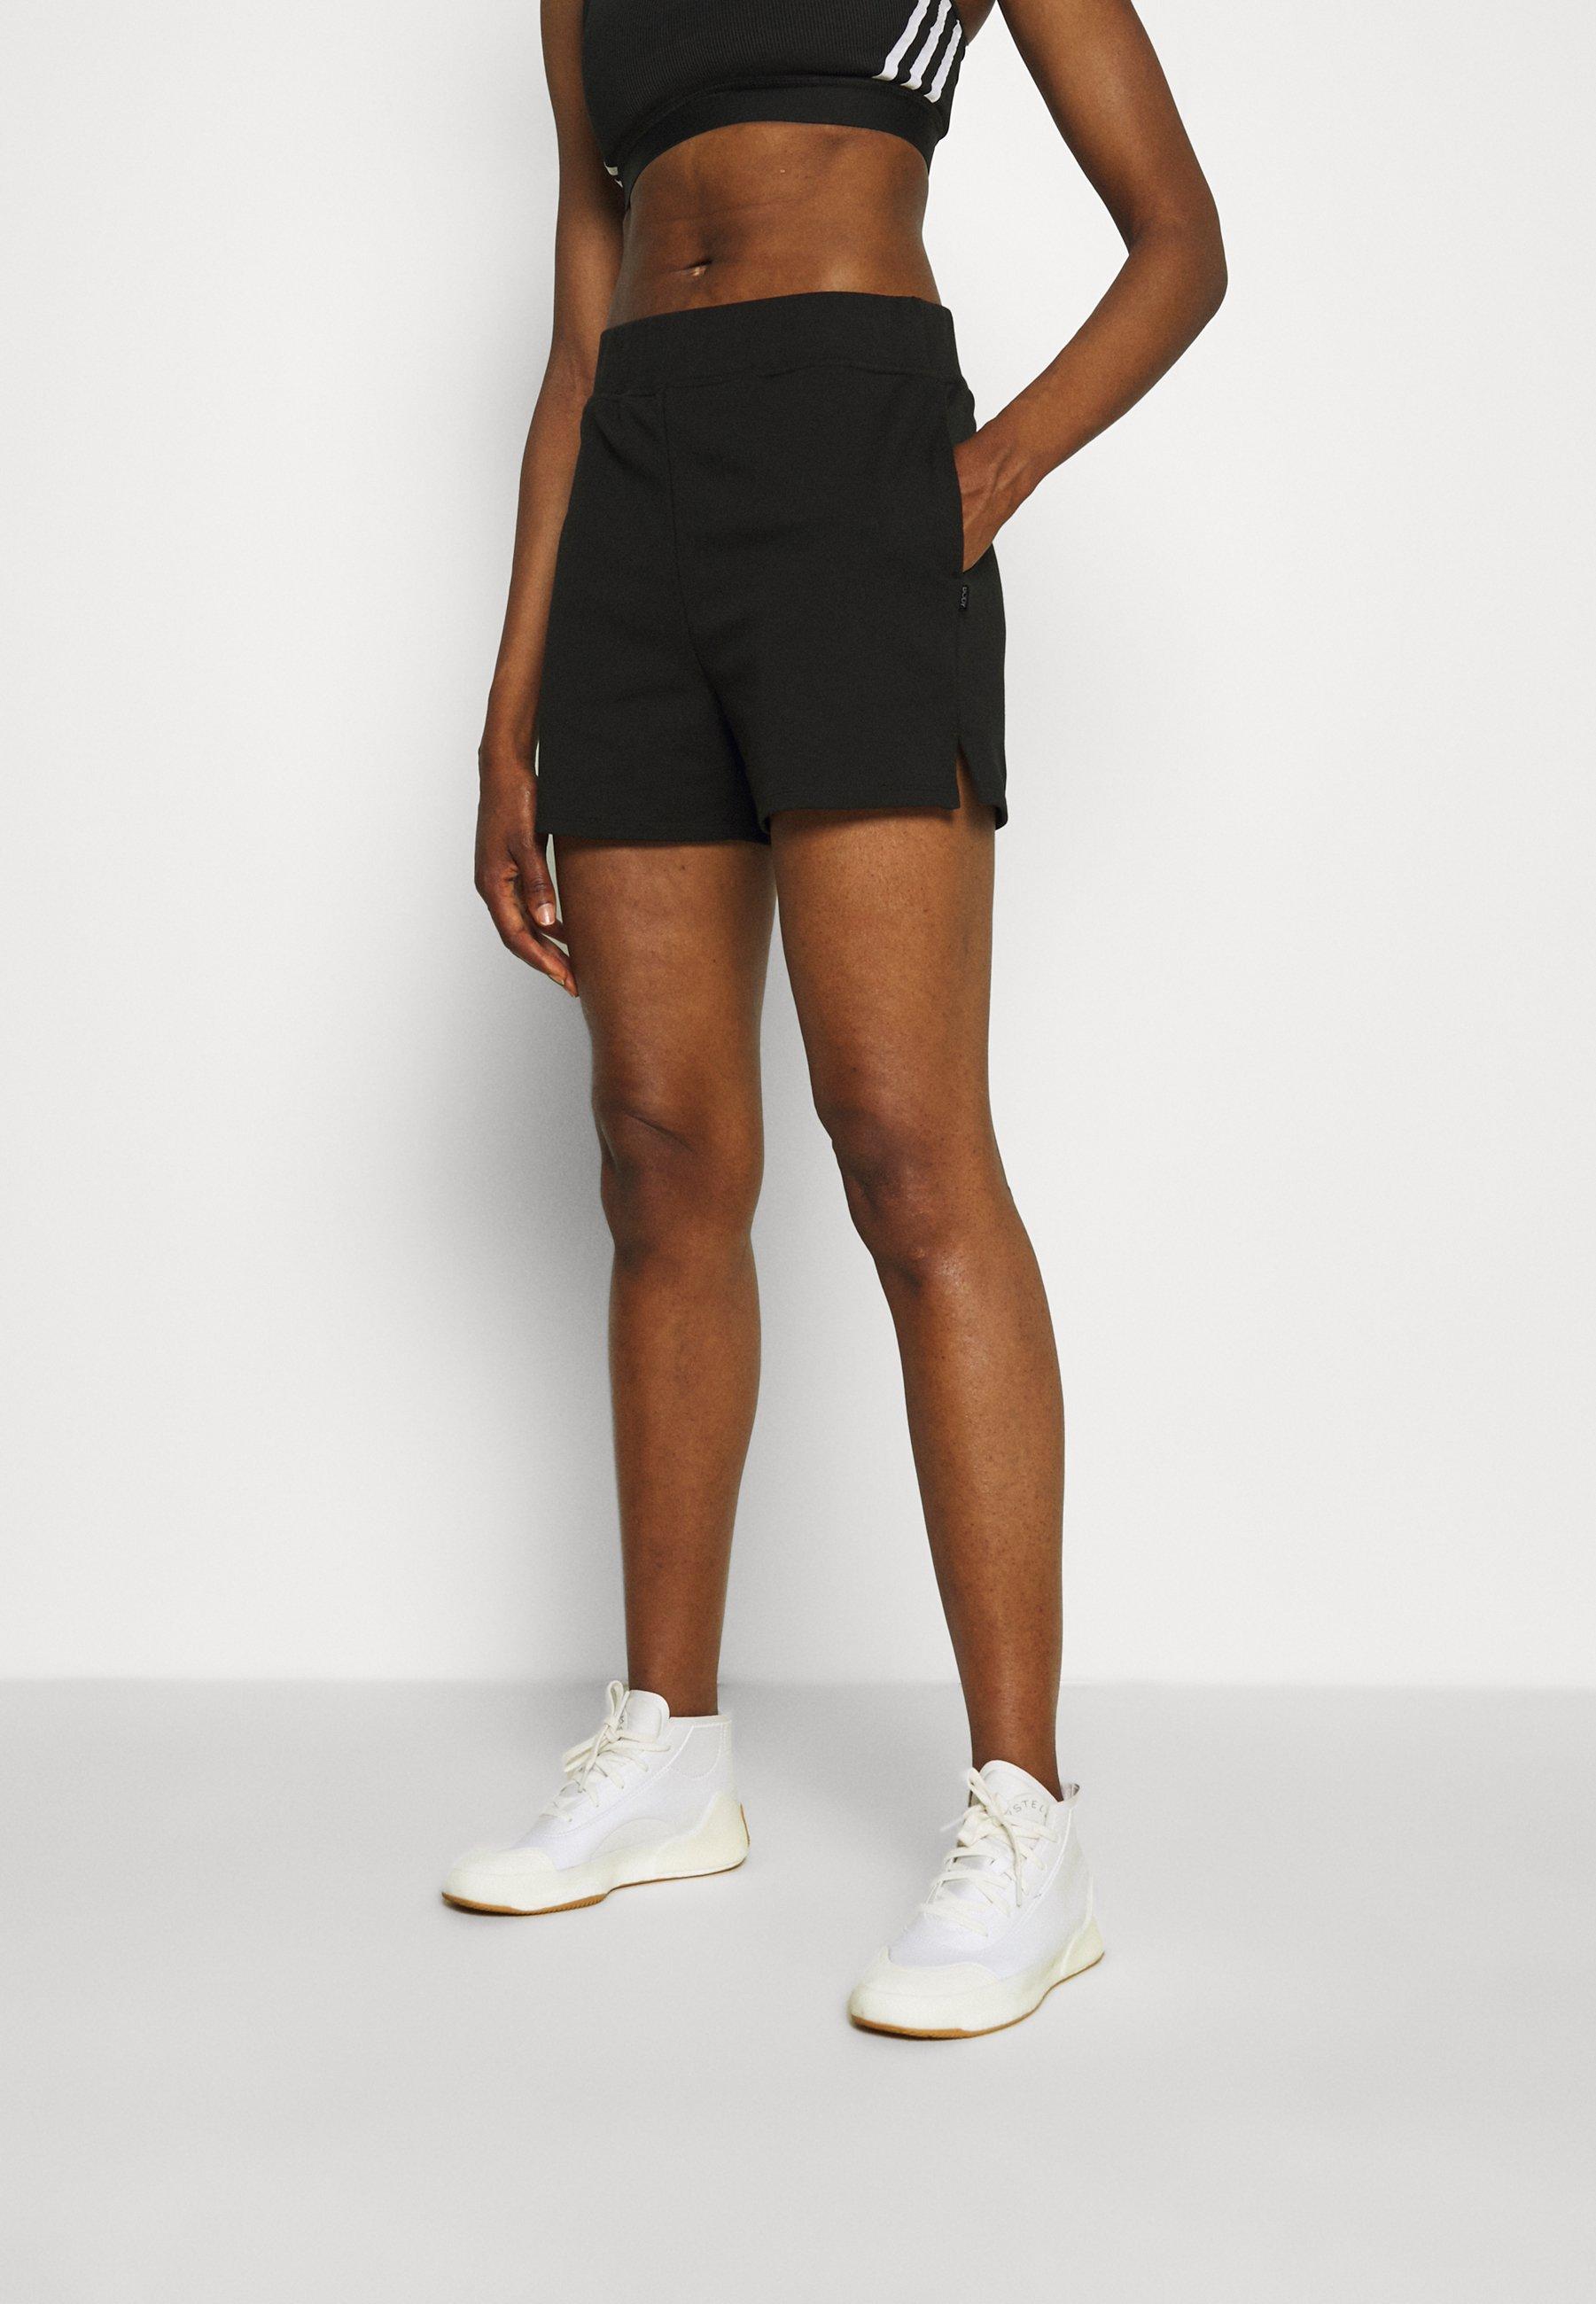 Damen POST SHORT - kurze Sporthose